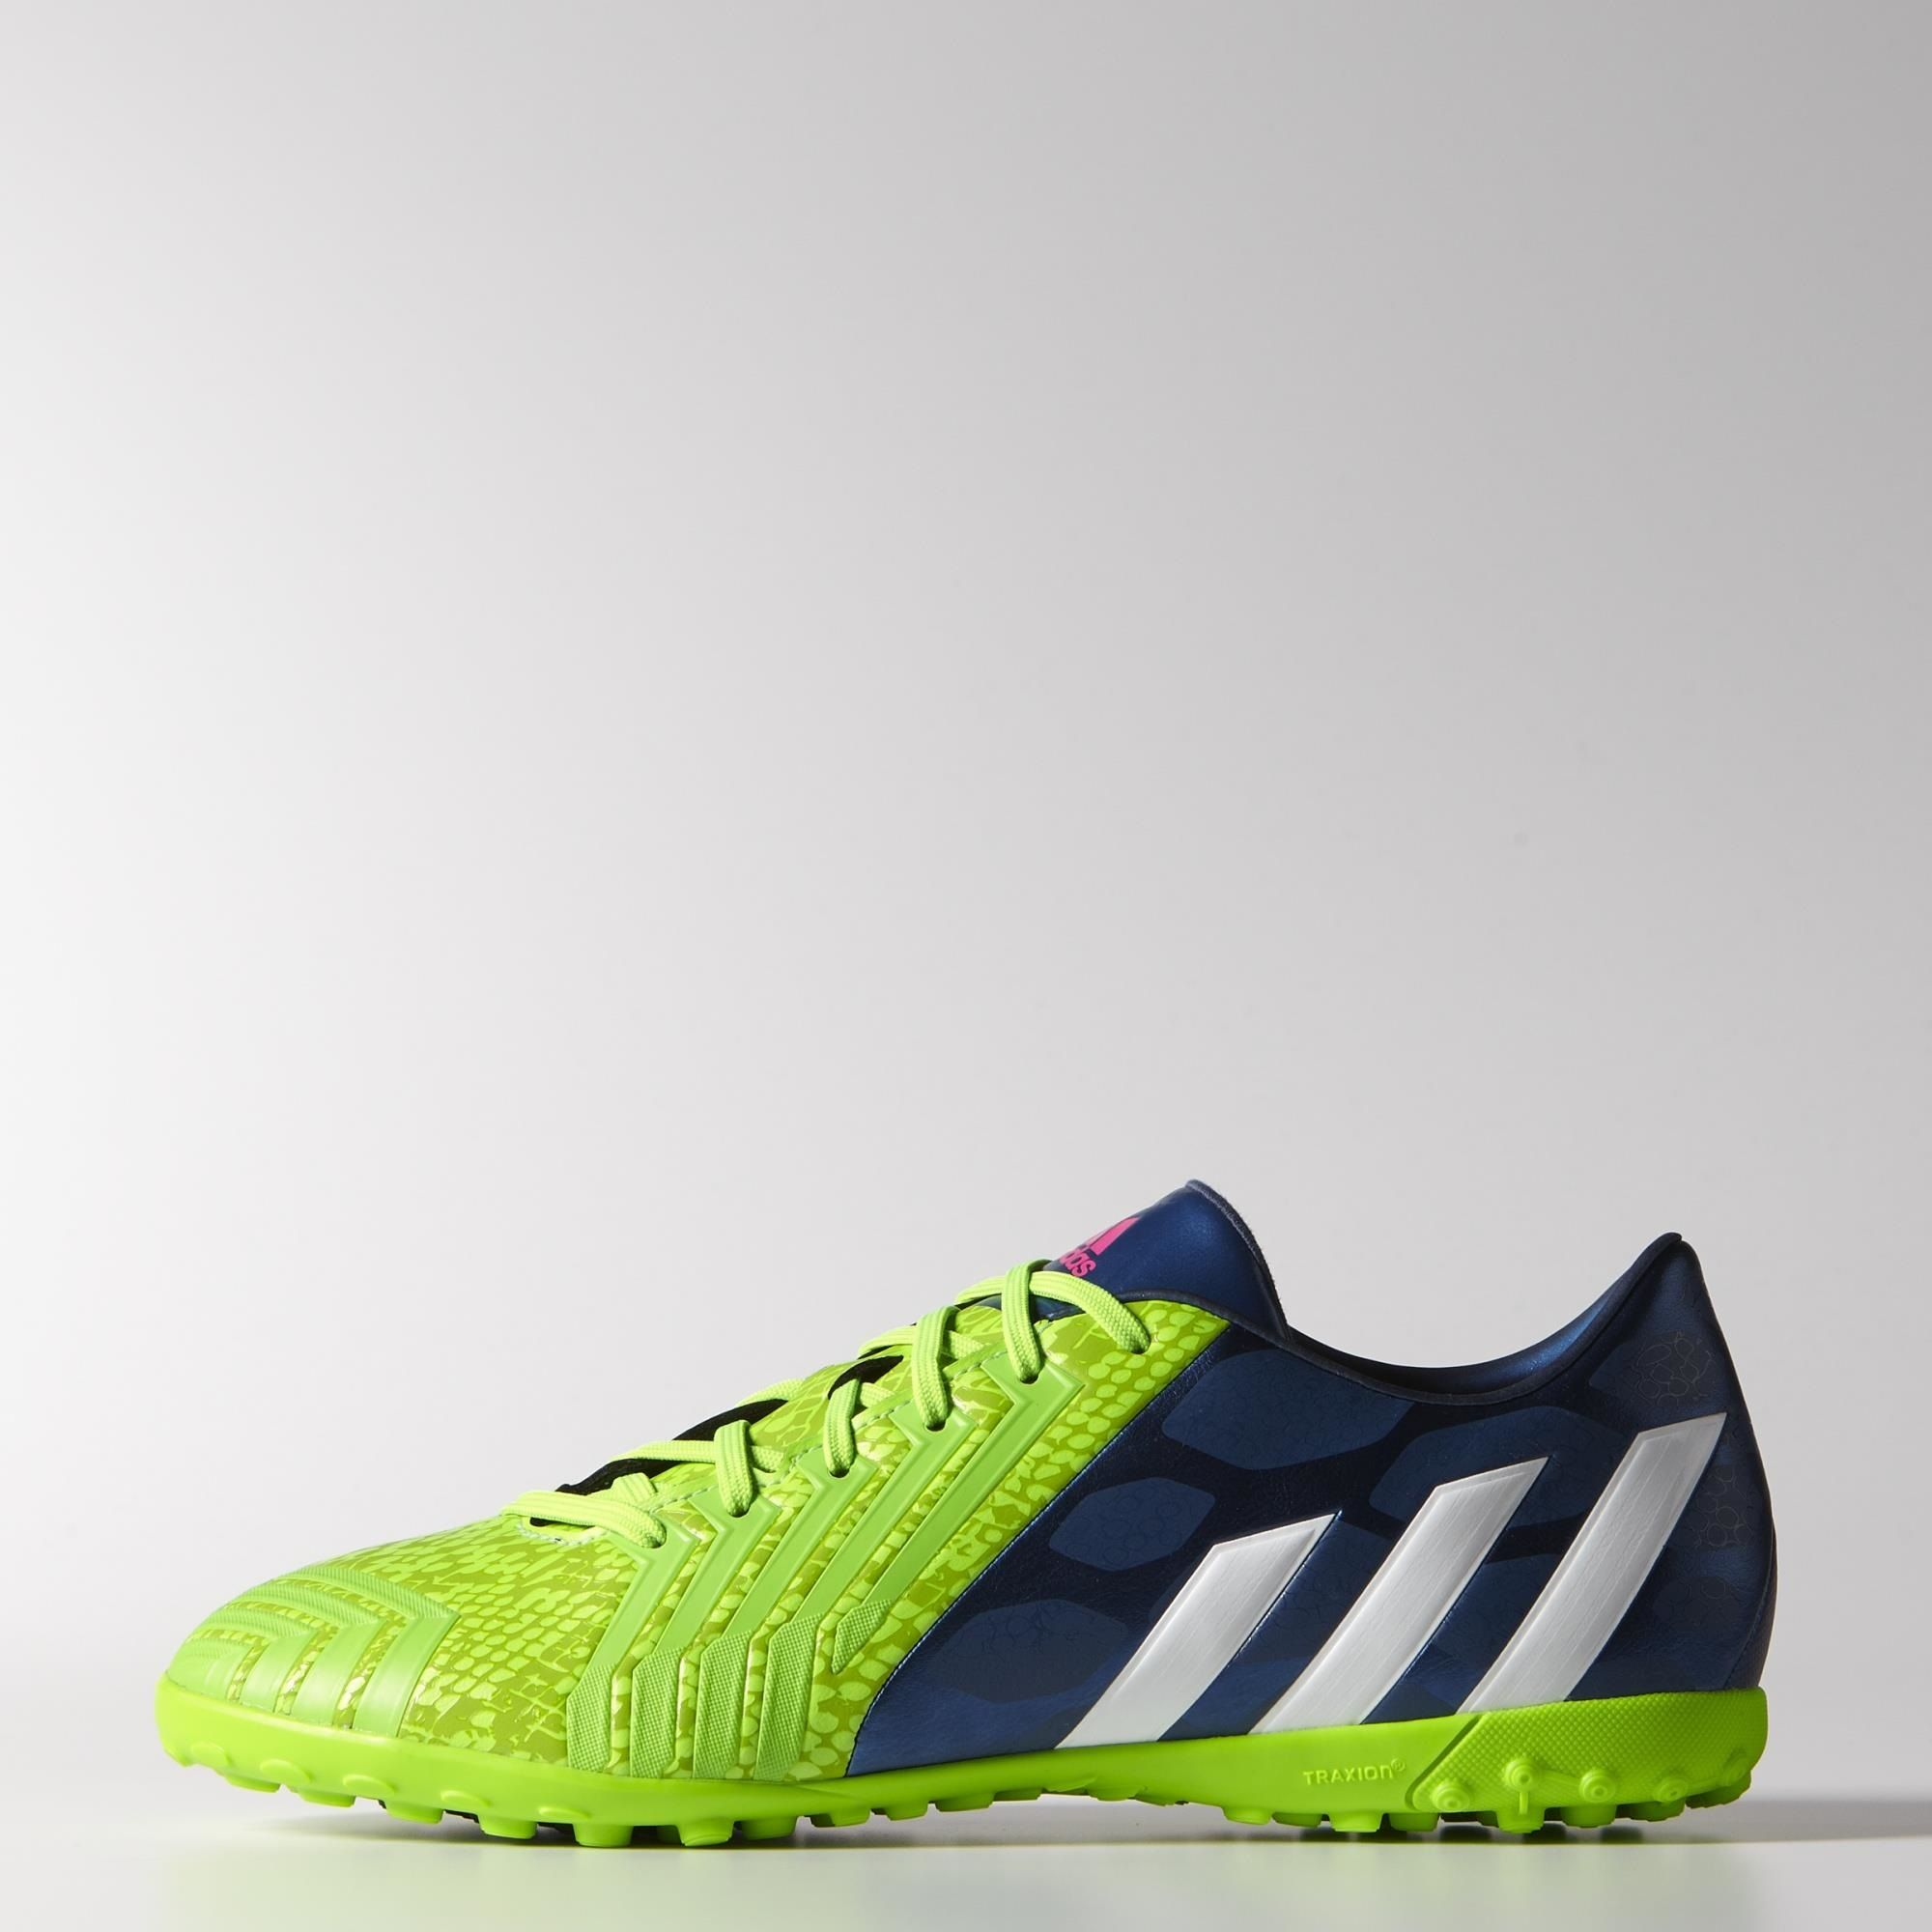 adidas Zapatos de Fútbol P Absolado Instinct Césped Artificial | adidas  Mexico